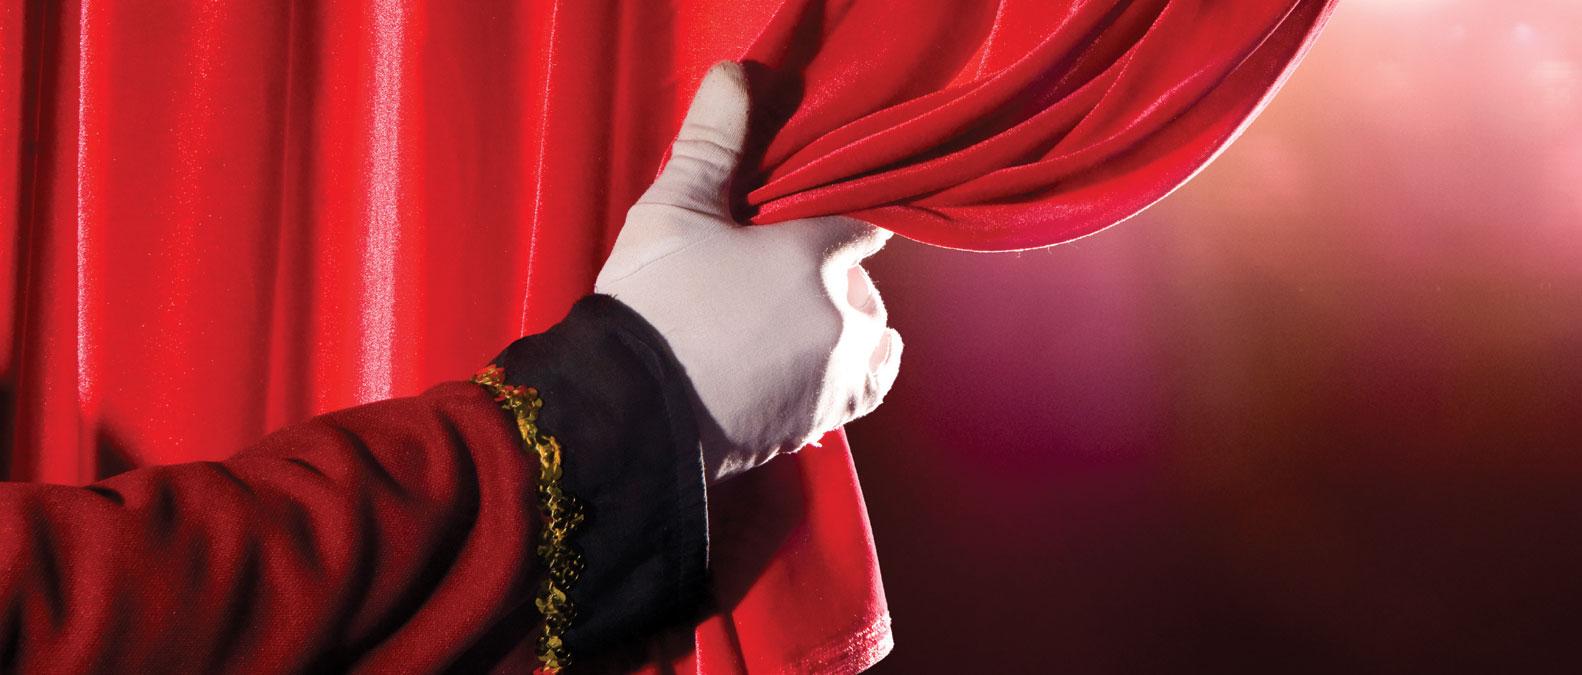 1376396750 theatre mystery